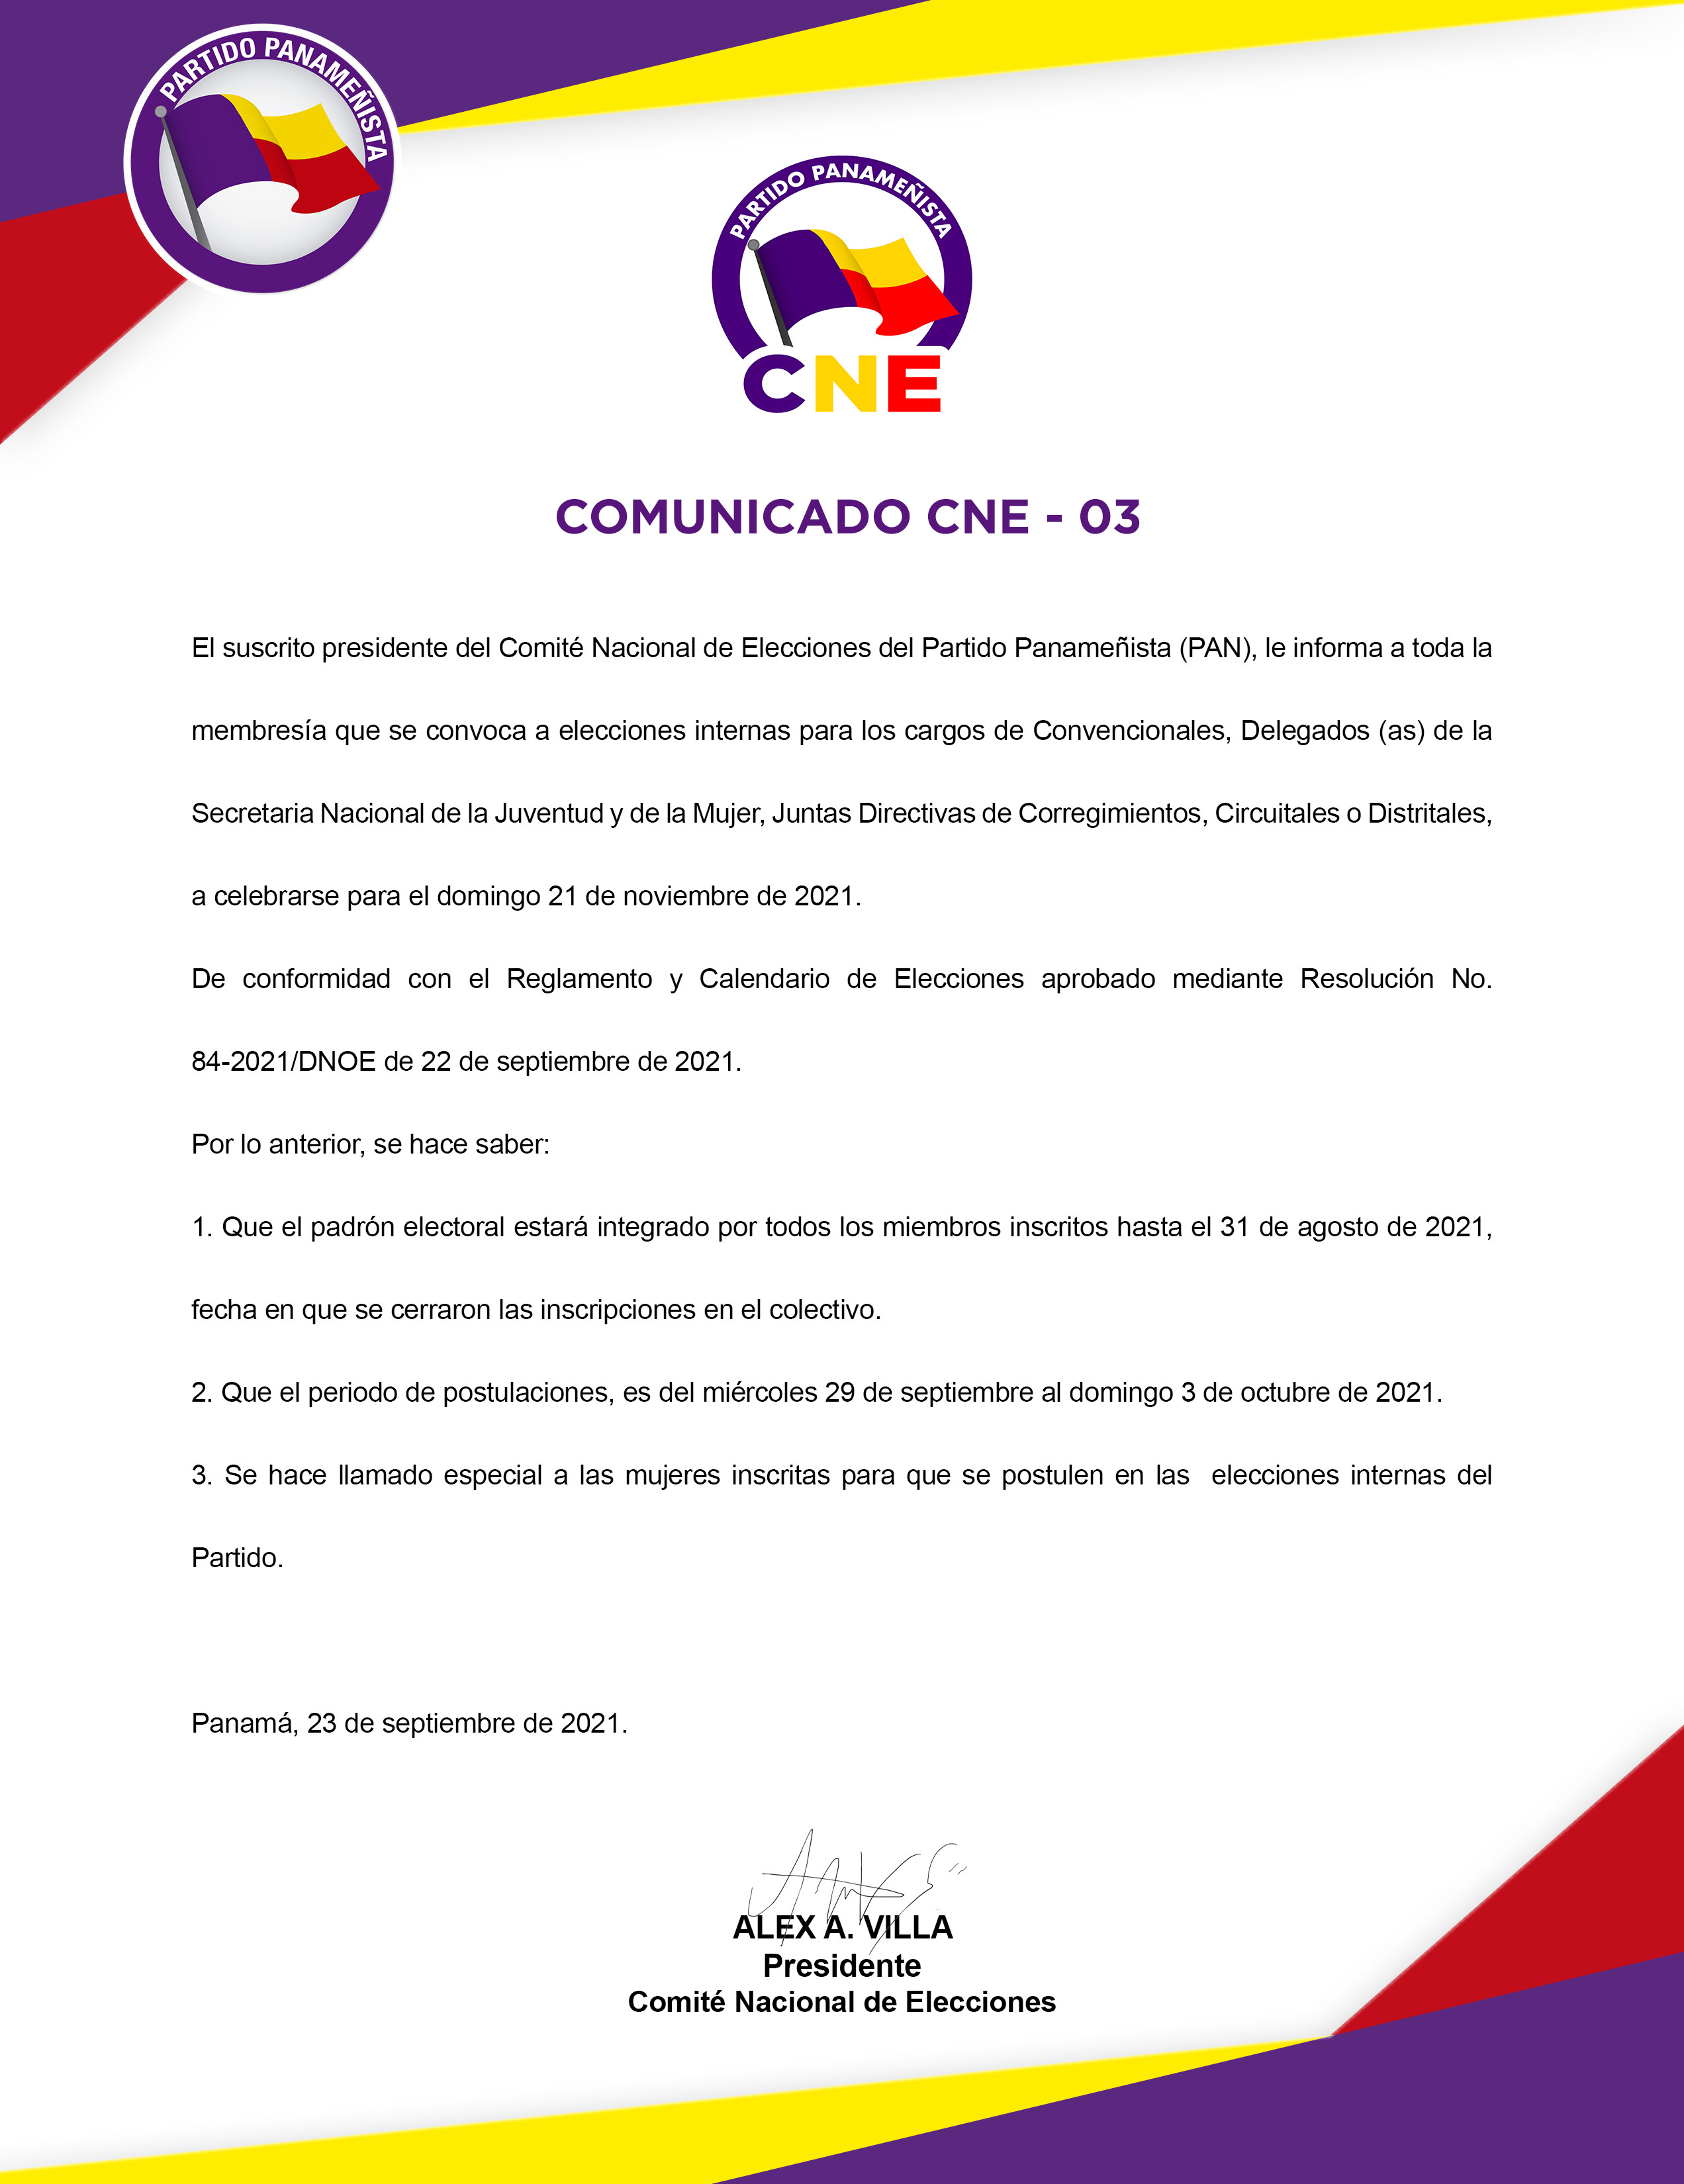 COMUNICACIONES_CNE-2021-2.jpg